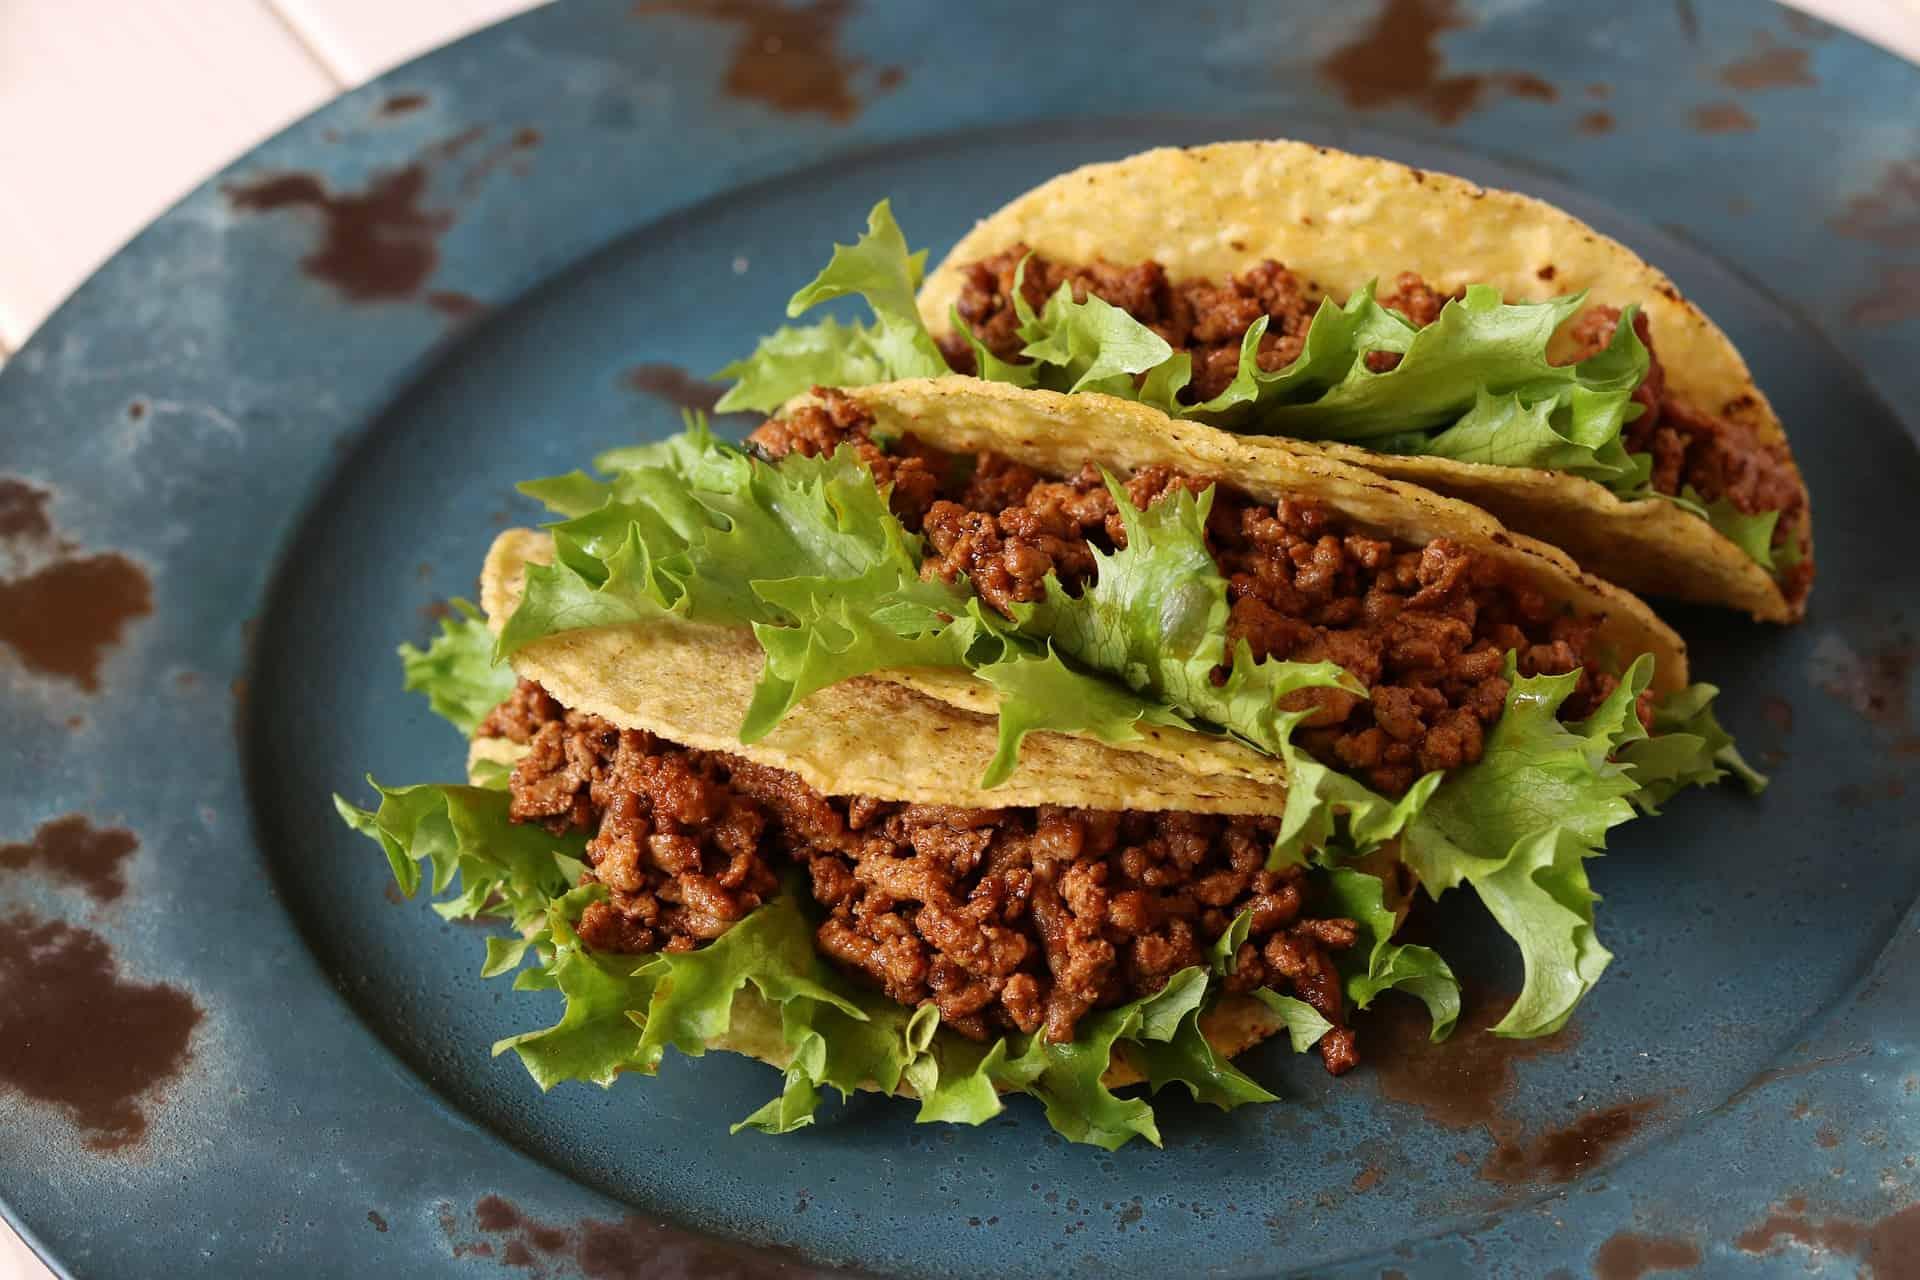 Taco, Mexican Food, Taco Tuesday, Tuesday